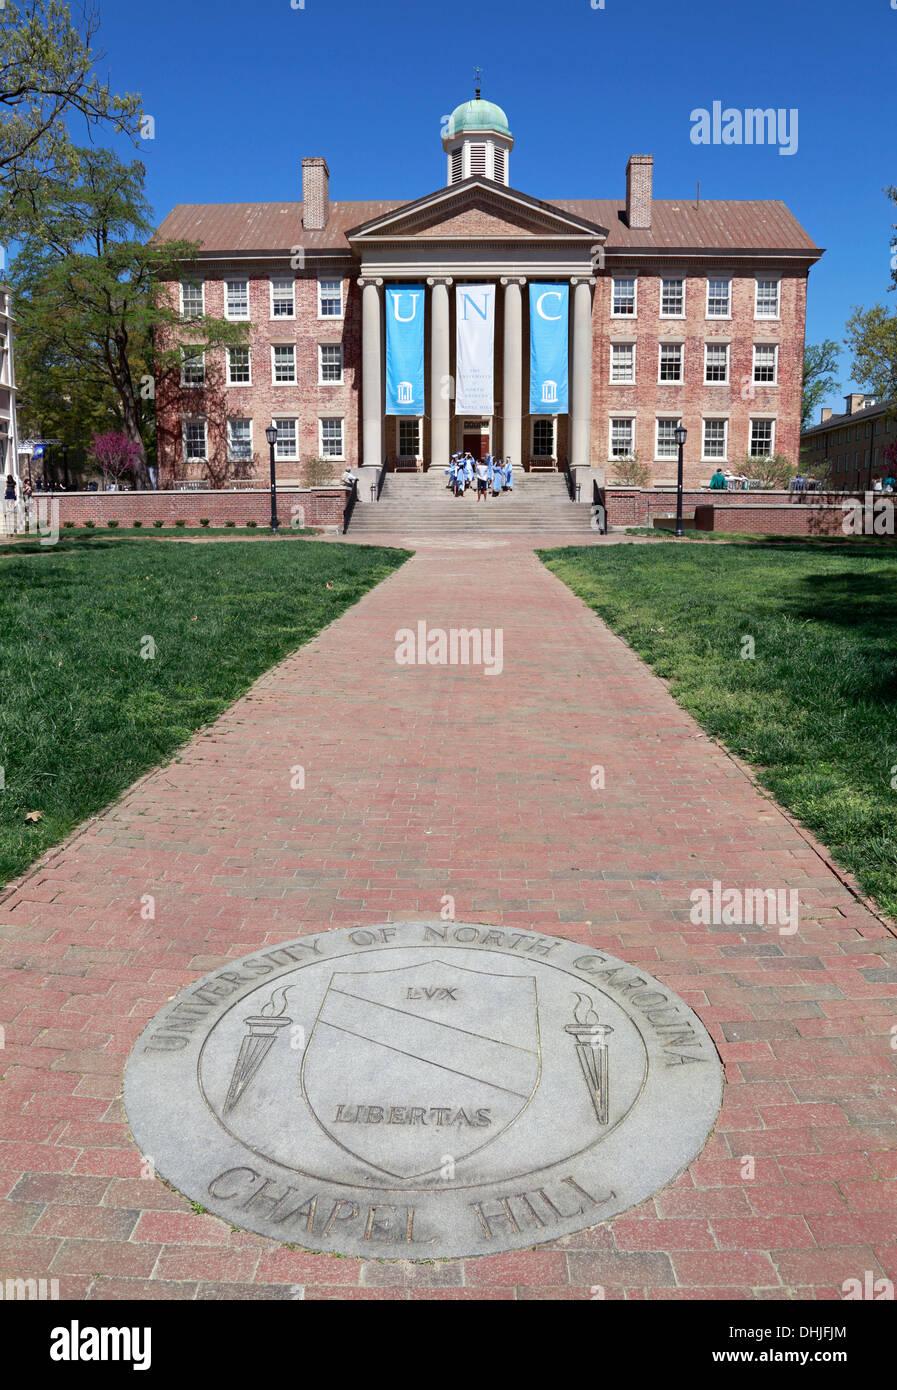 University of North Carolina Chapel Hill, UNC, campus. South building. - Stock Image